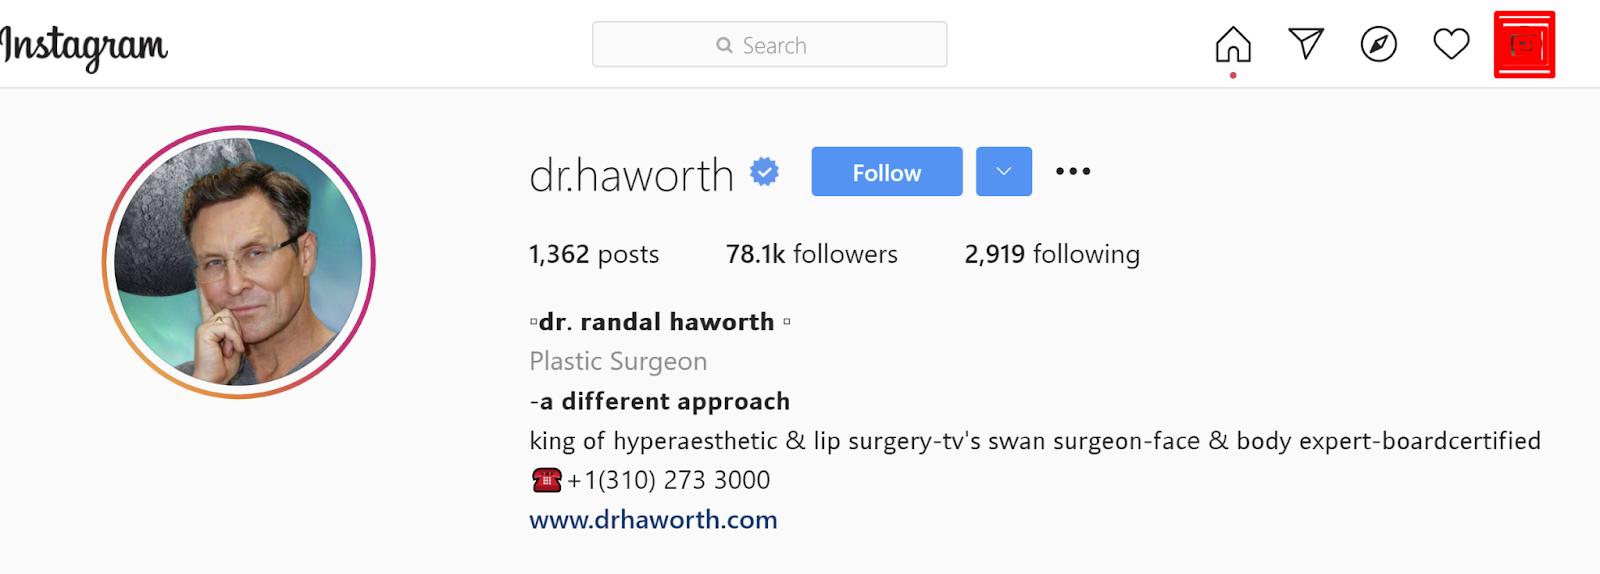 @dr.haworth Instagram